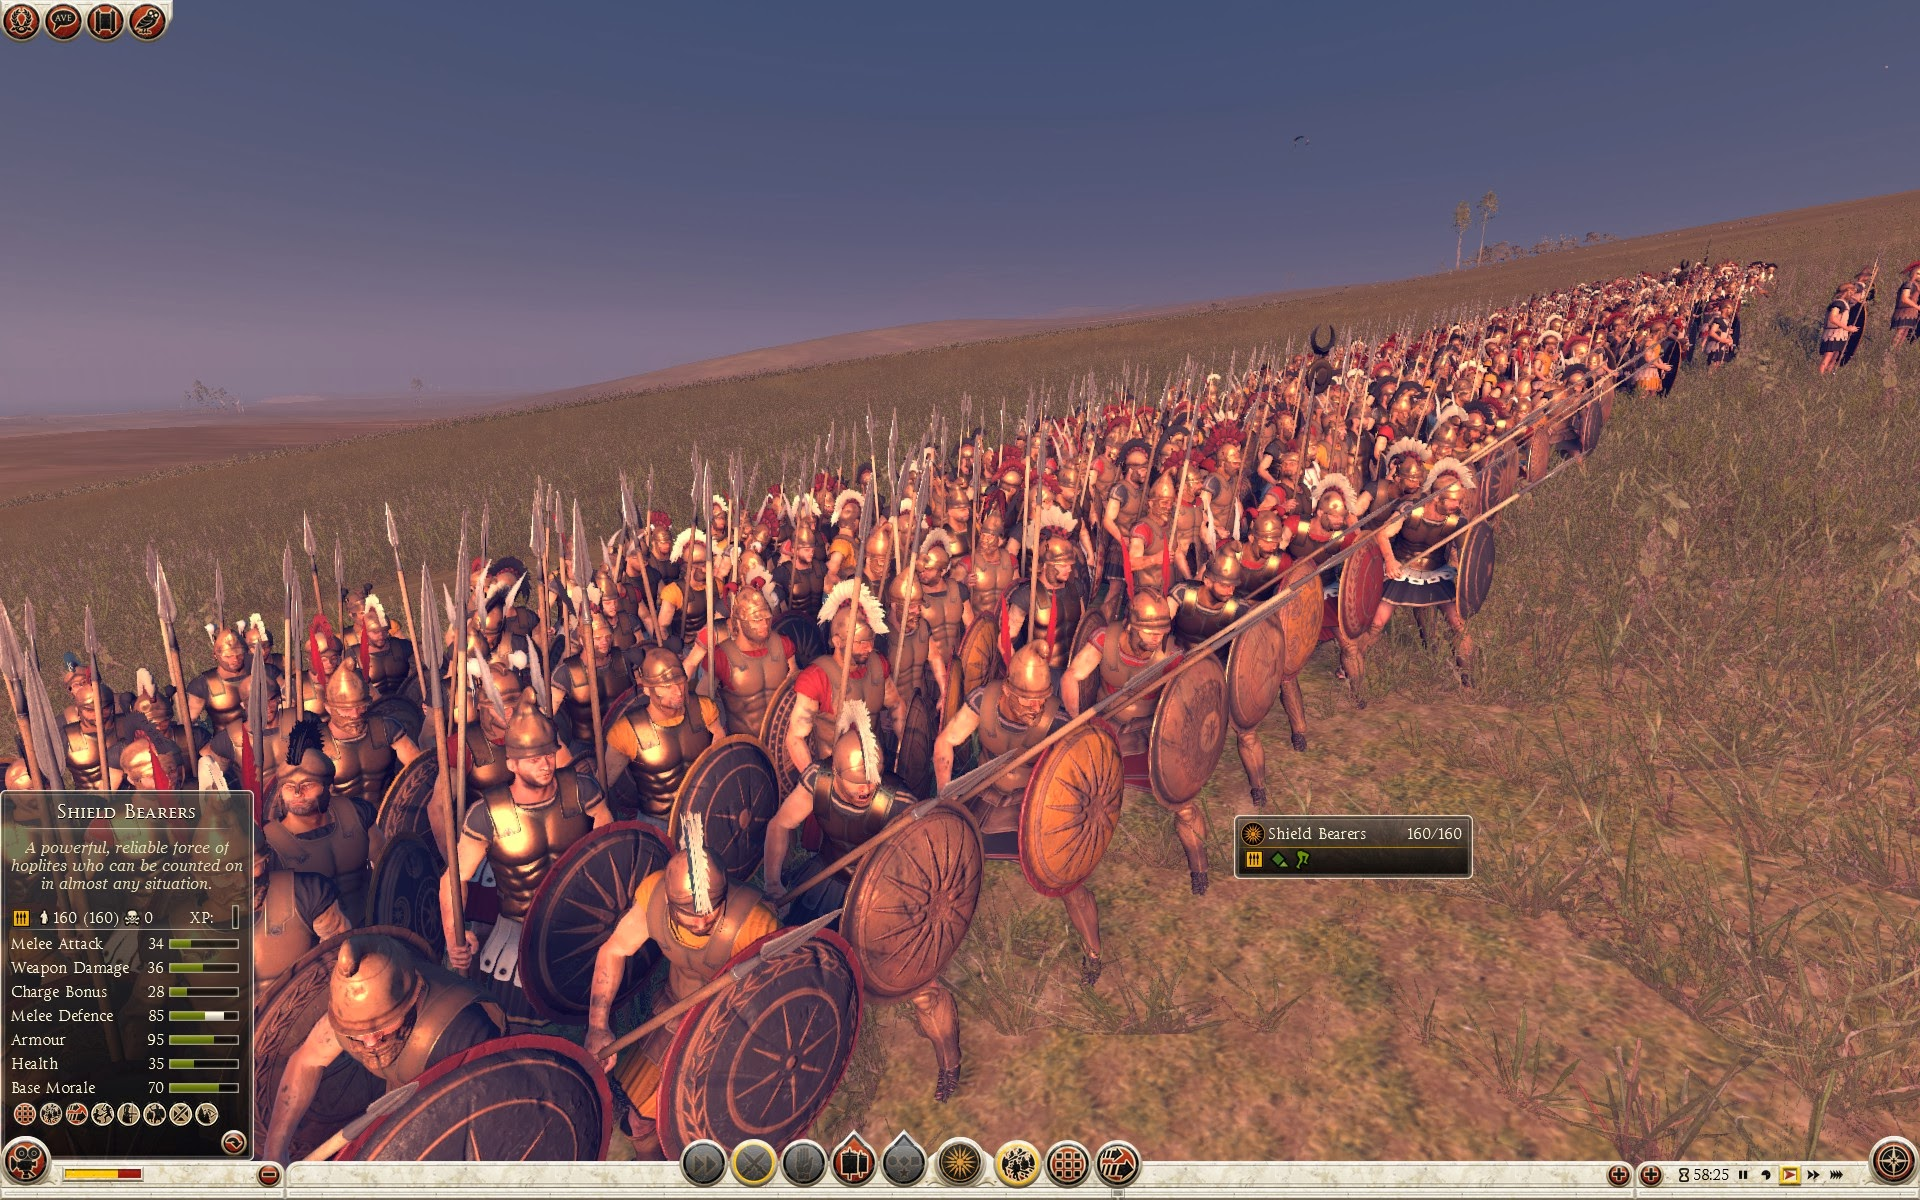 Shield Bearers - Macedon - Total War: Rome II - Royal Military Academy